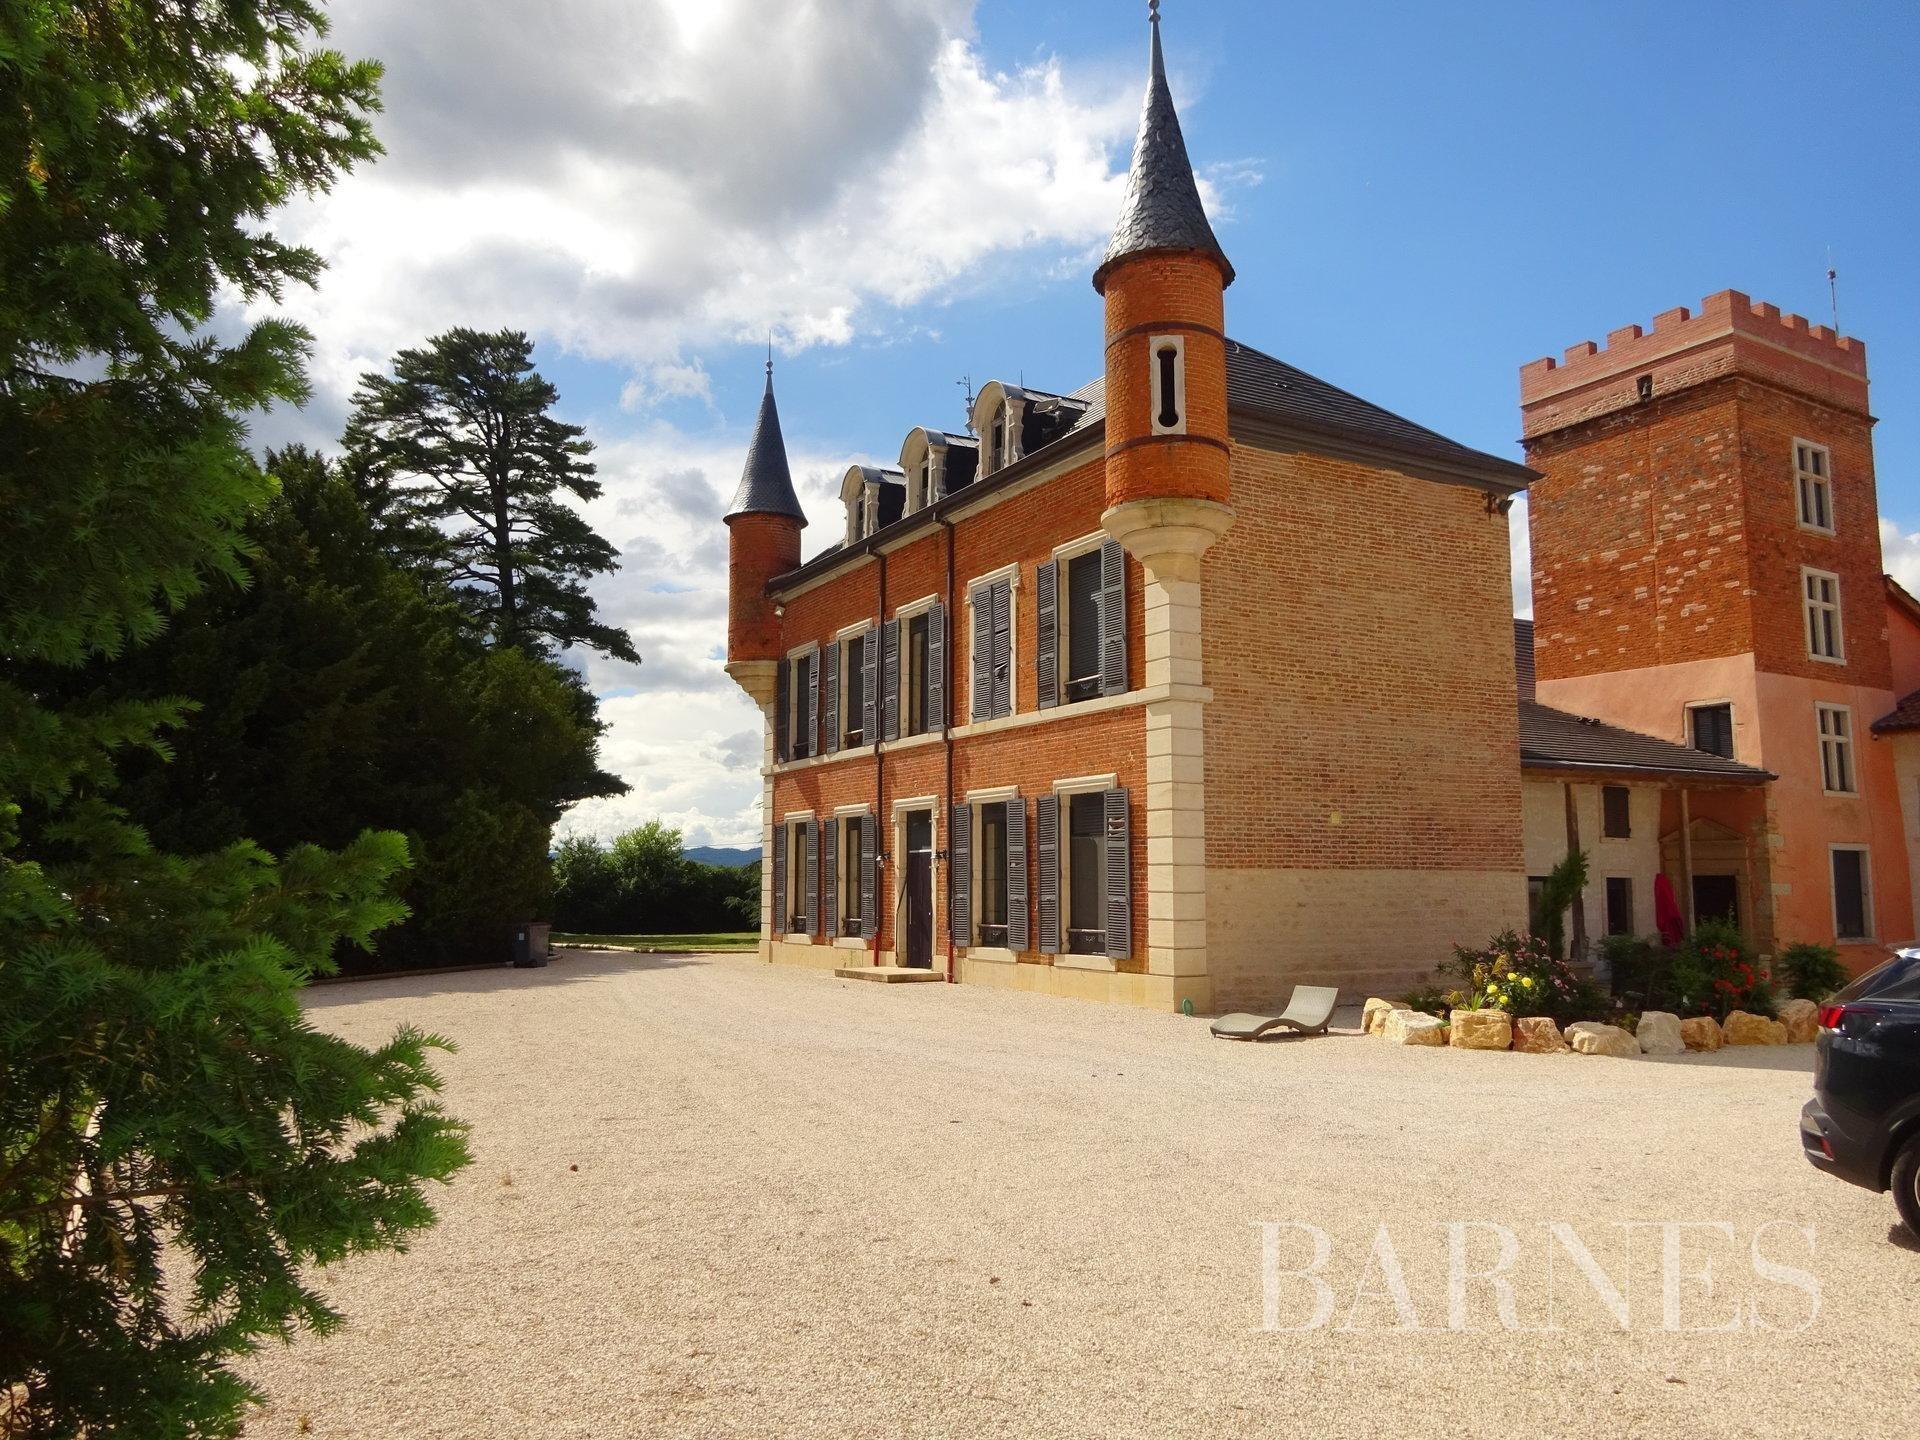 Castle in Grièges, Auvergne-Rhône-Alpes, France 1